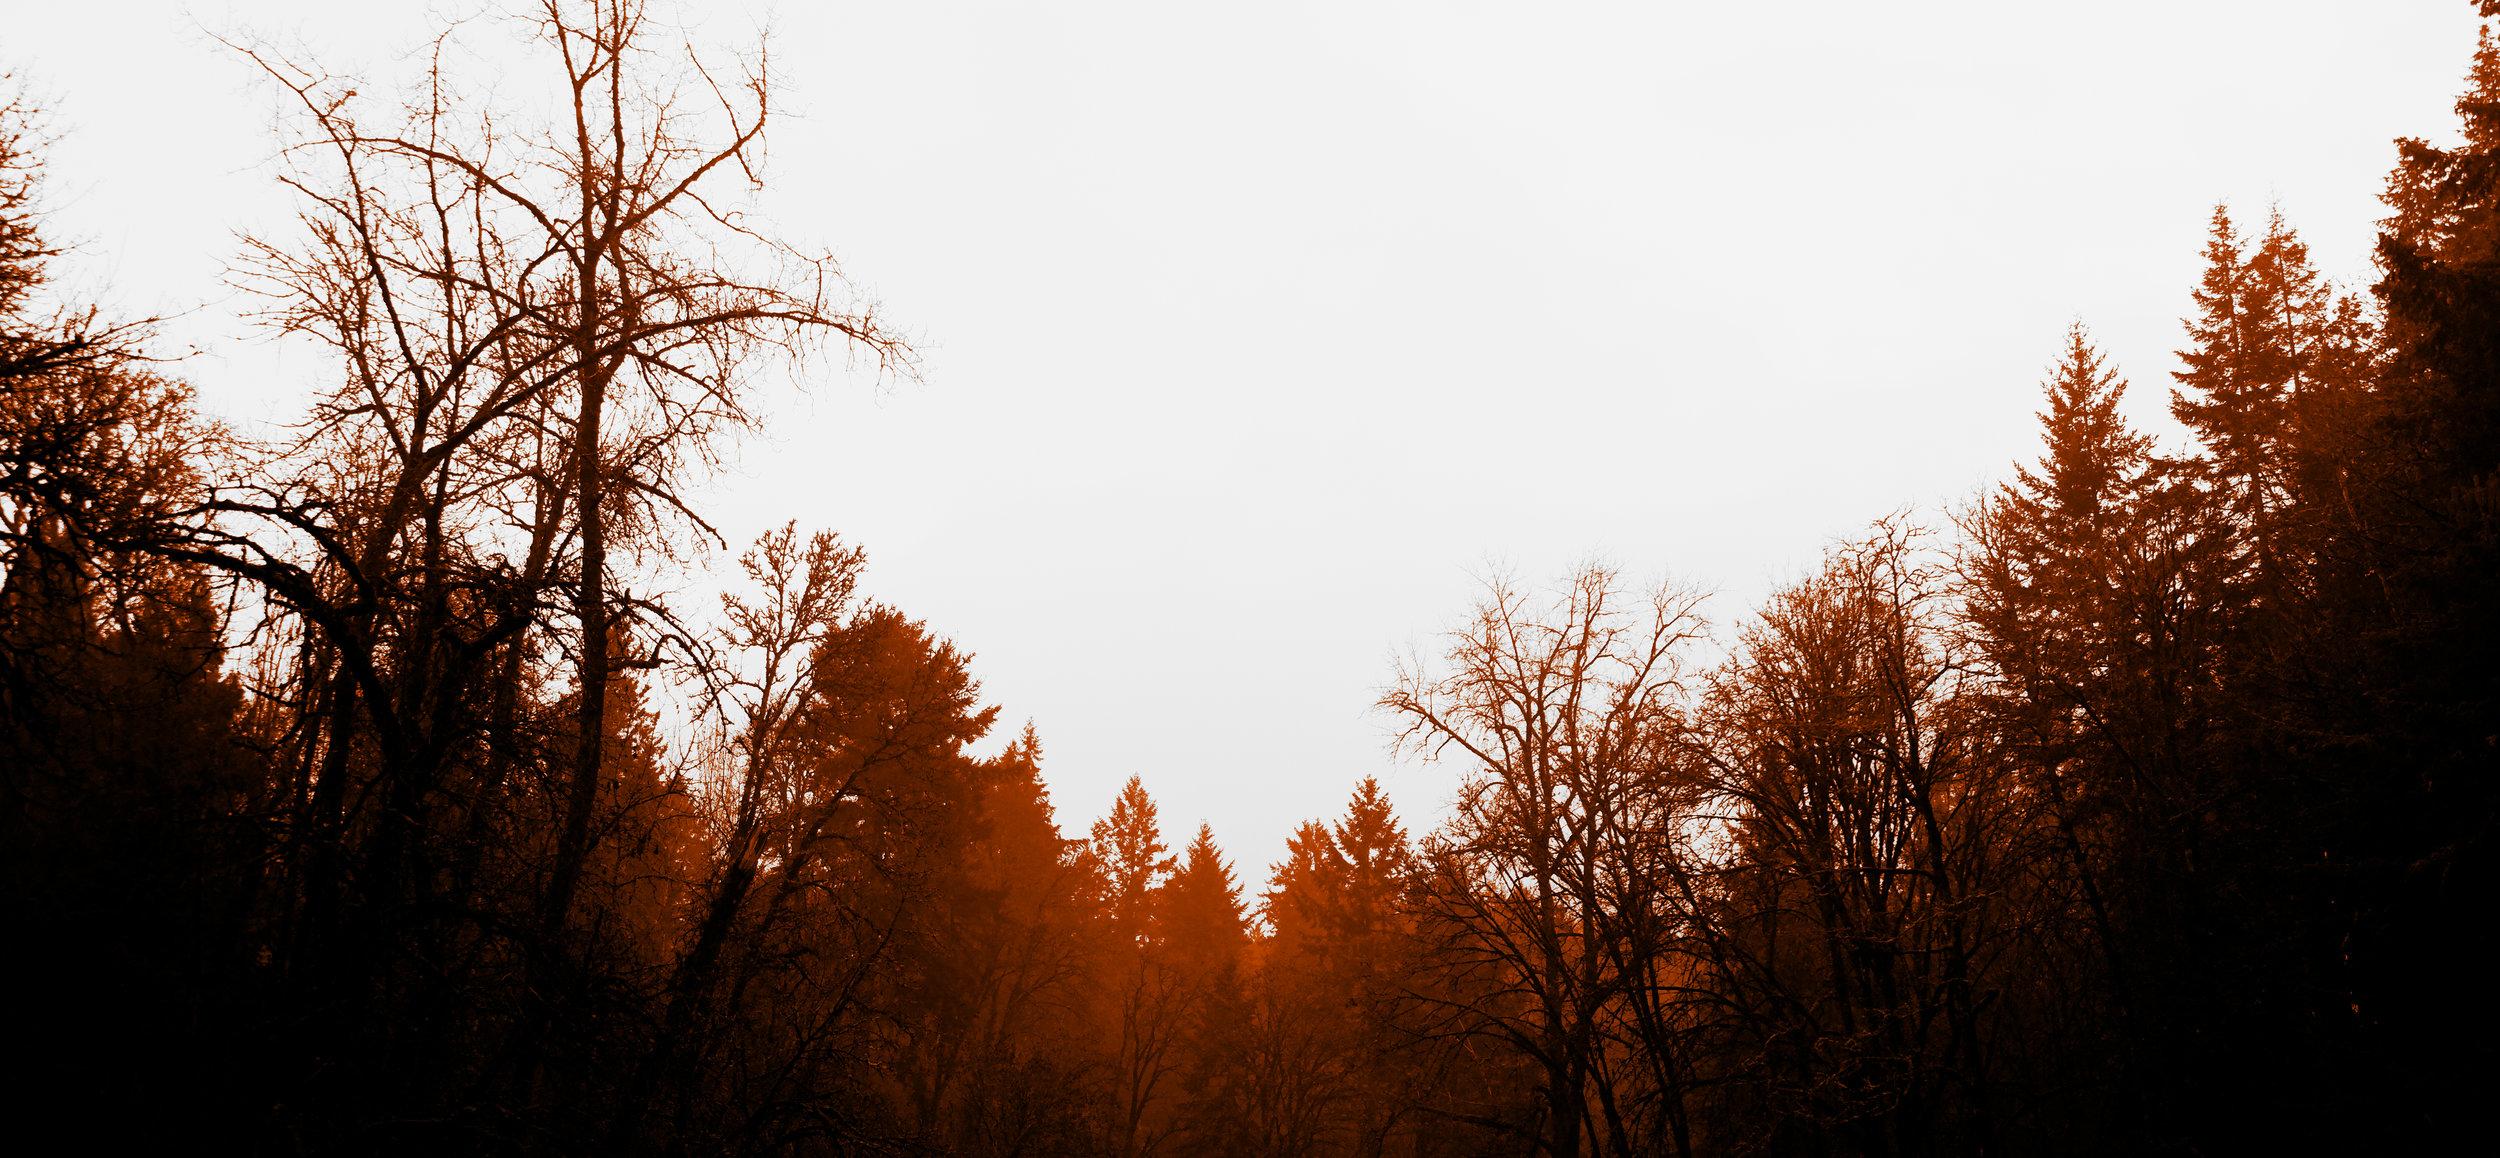 Dark forest - Nathaniel Barber Blog